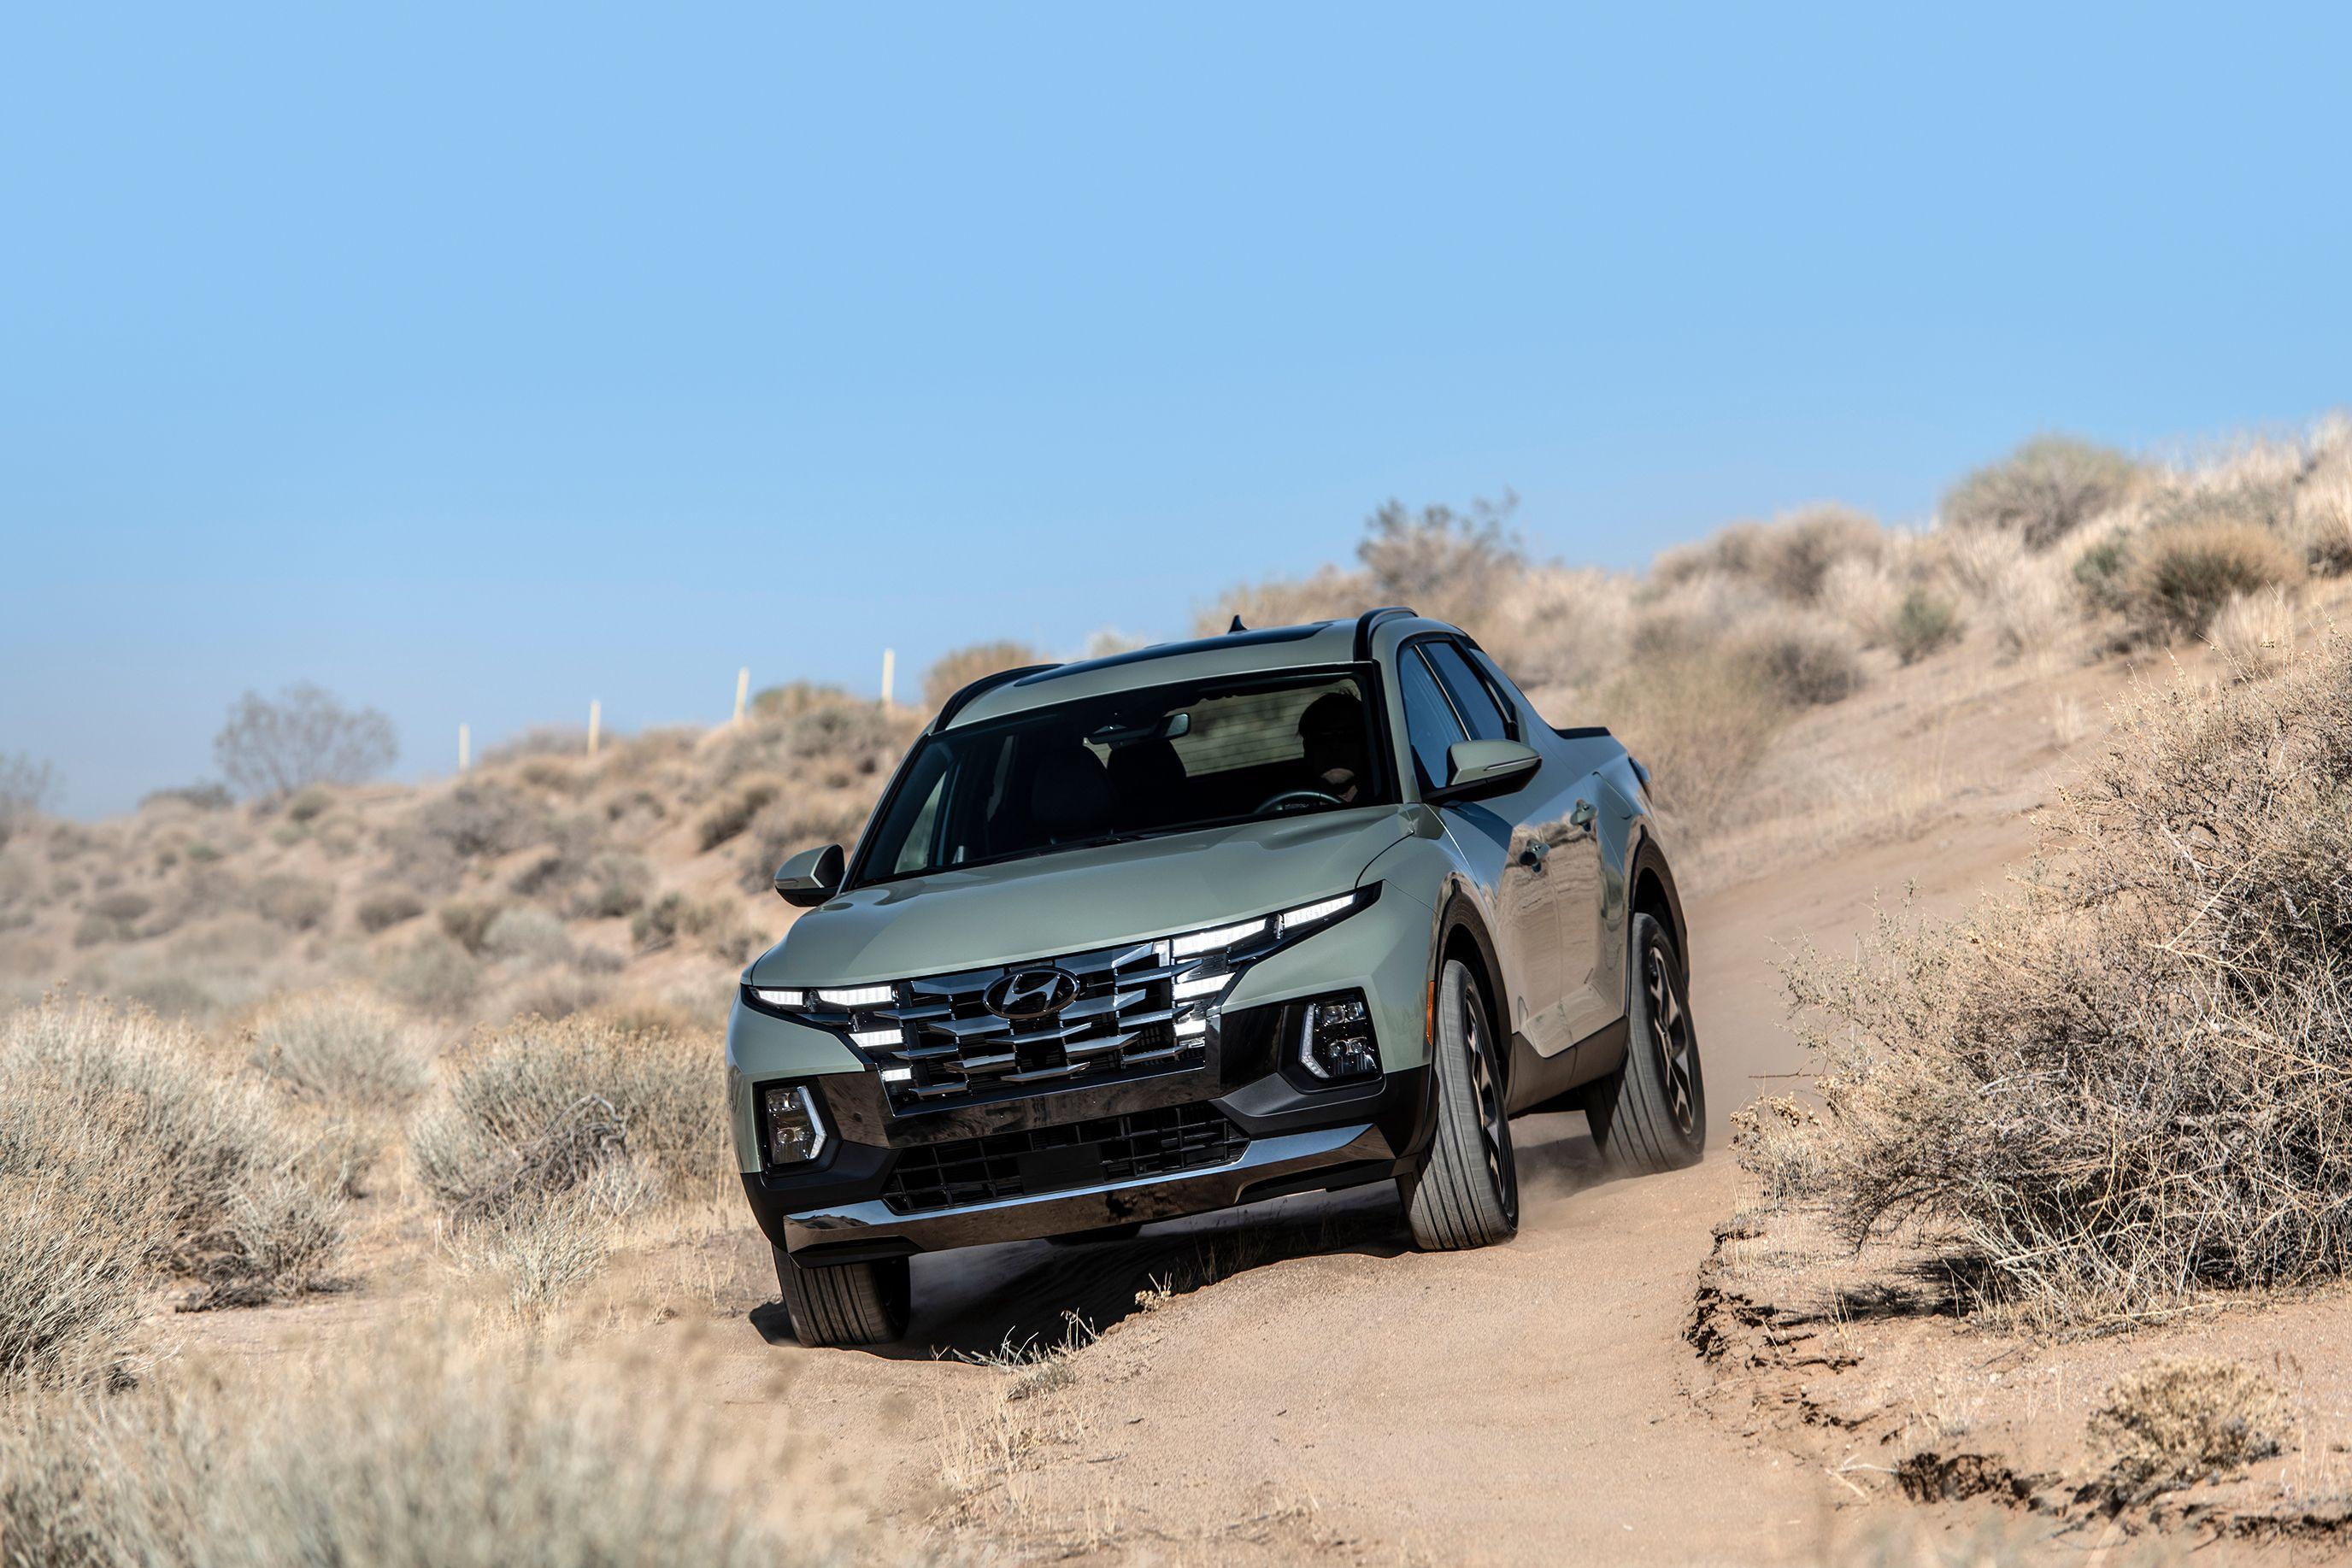 2022 Hyundai Santa Cruz - Full Image Gallery